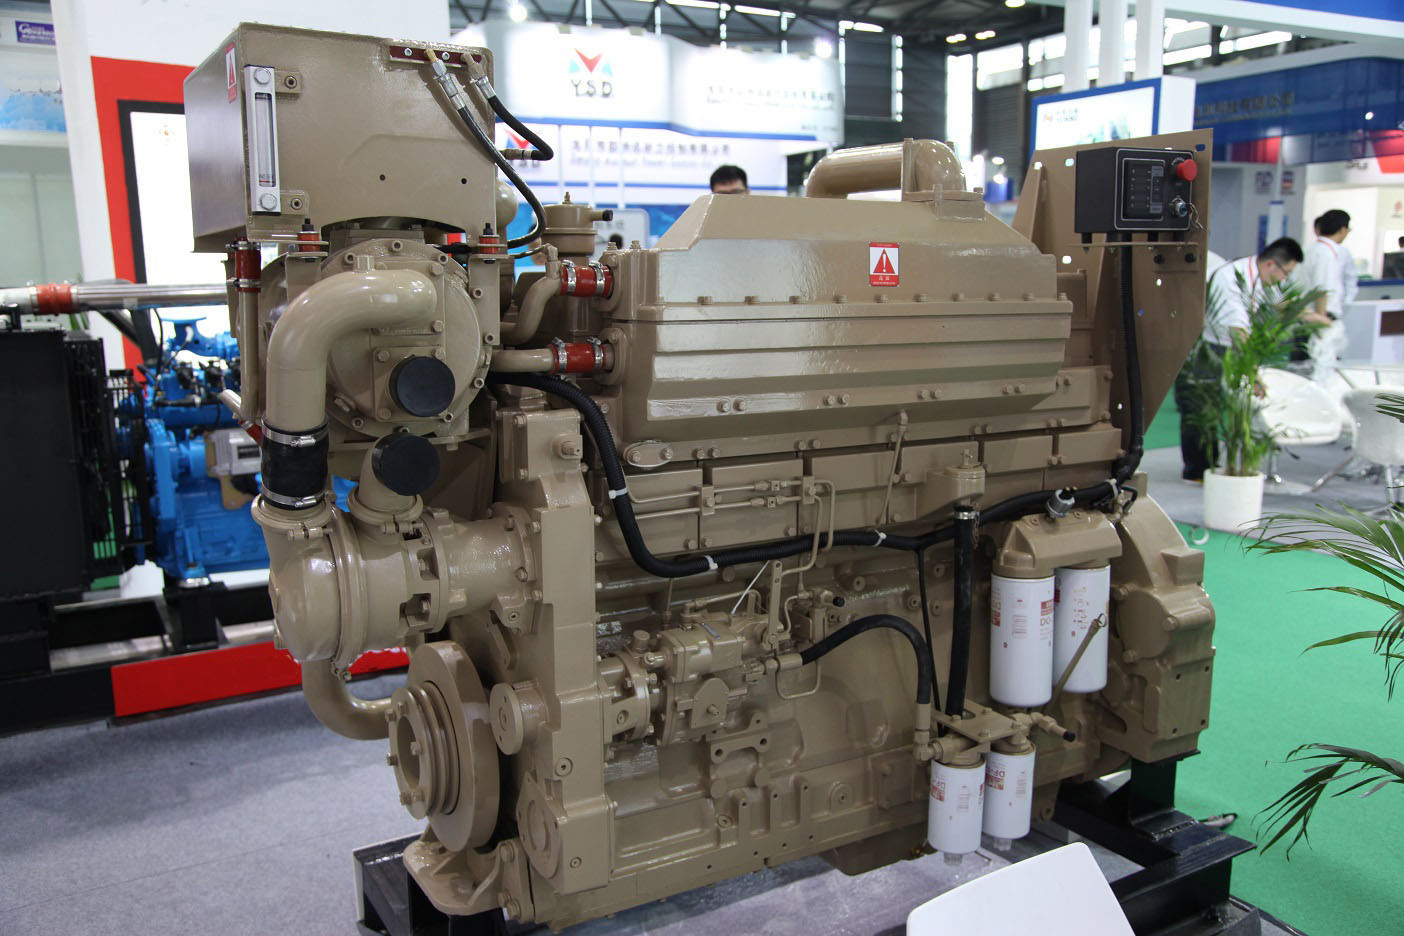 China Cummins Kta19 M3/M4 Marine Inboard Diesel Engine for Boat/Ship/Vessel  - China Marine Engine, Inboard Marine Engines